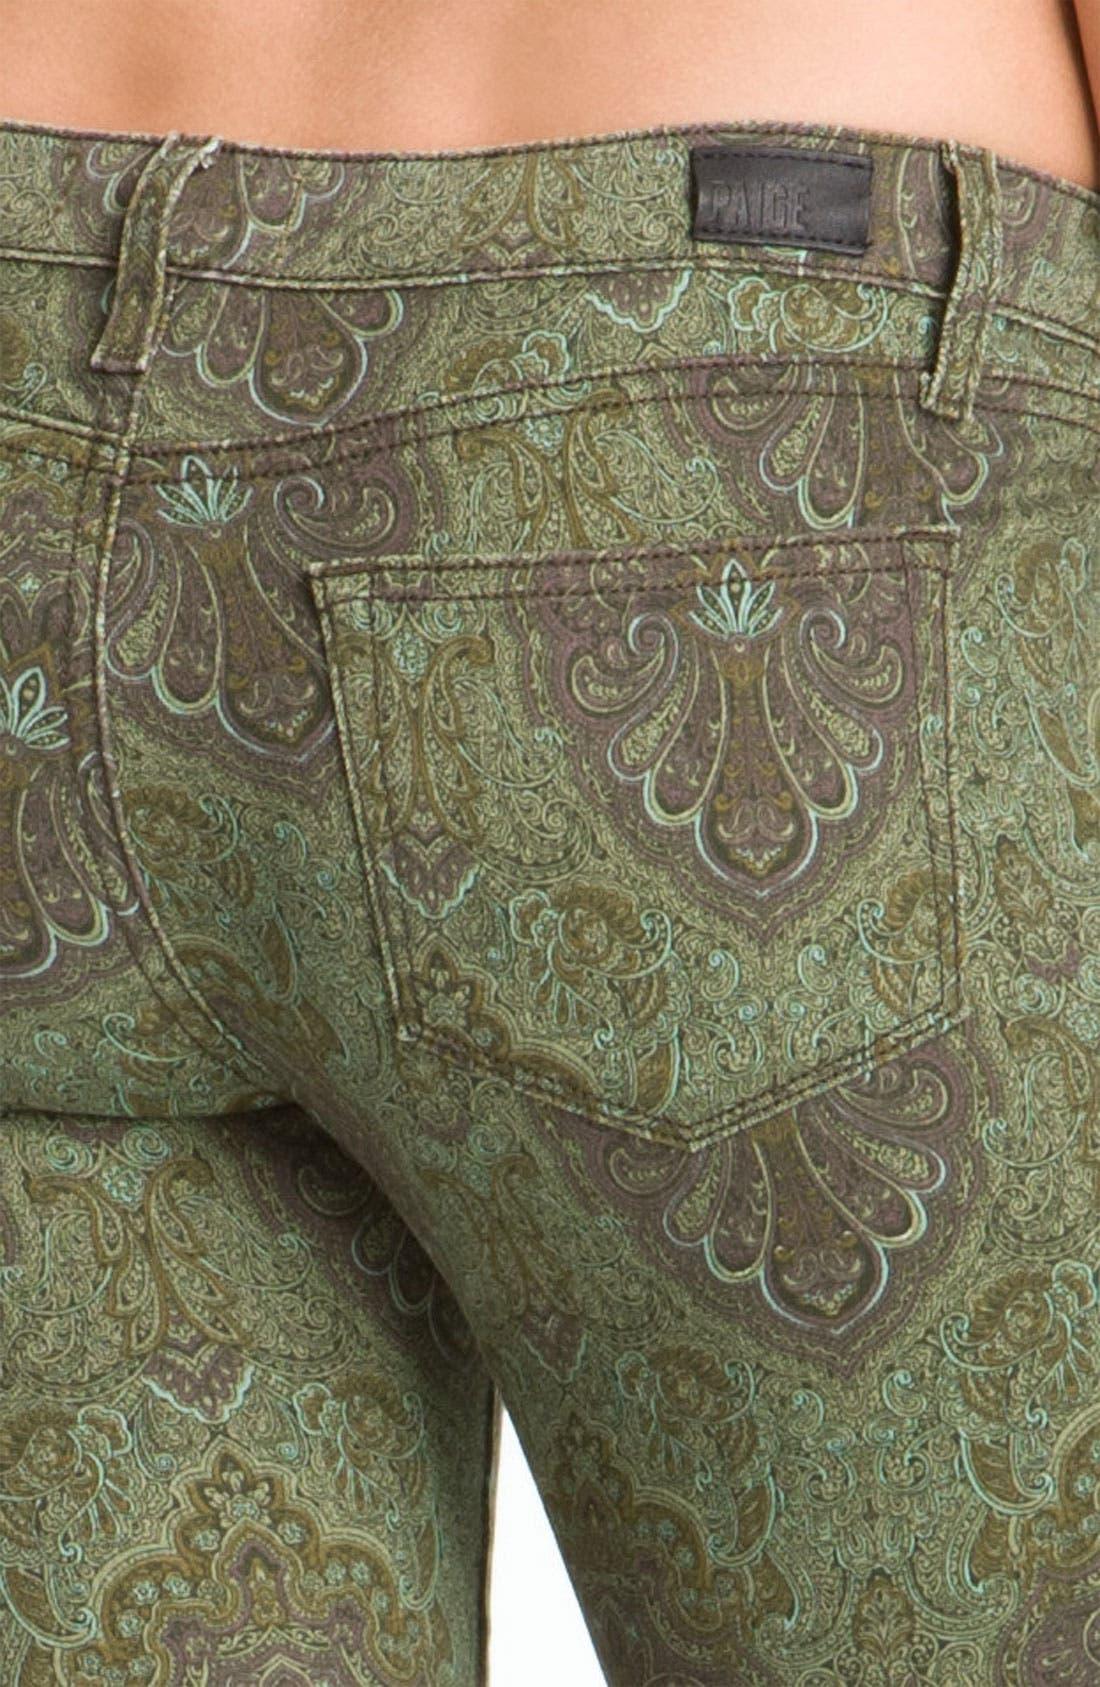 Denim 'Verdugo' Print Skinny Jeans,                             Alternate thumbnail 4, color,                             300